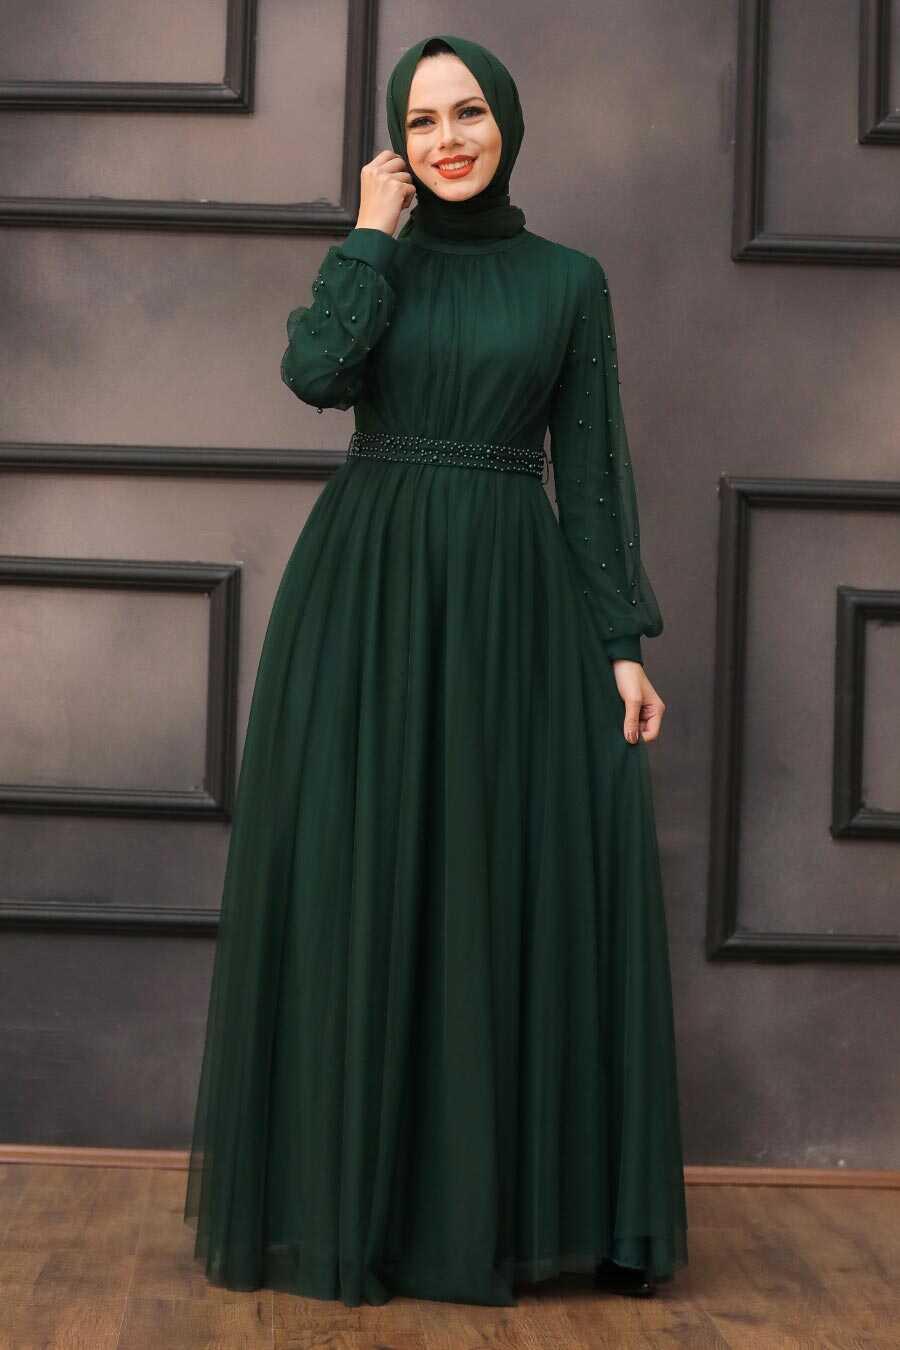 Green Hijab Evening Dress 5514Y